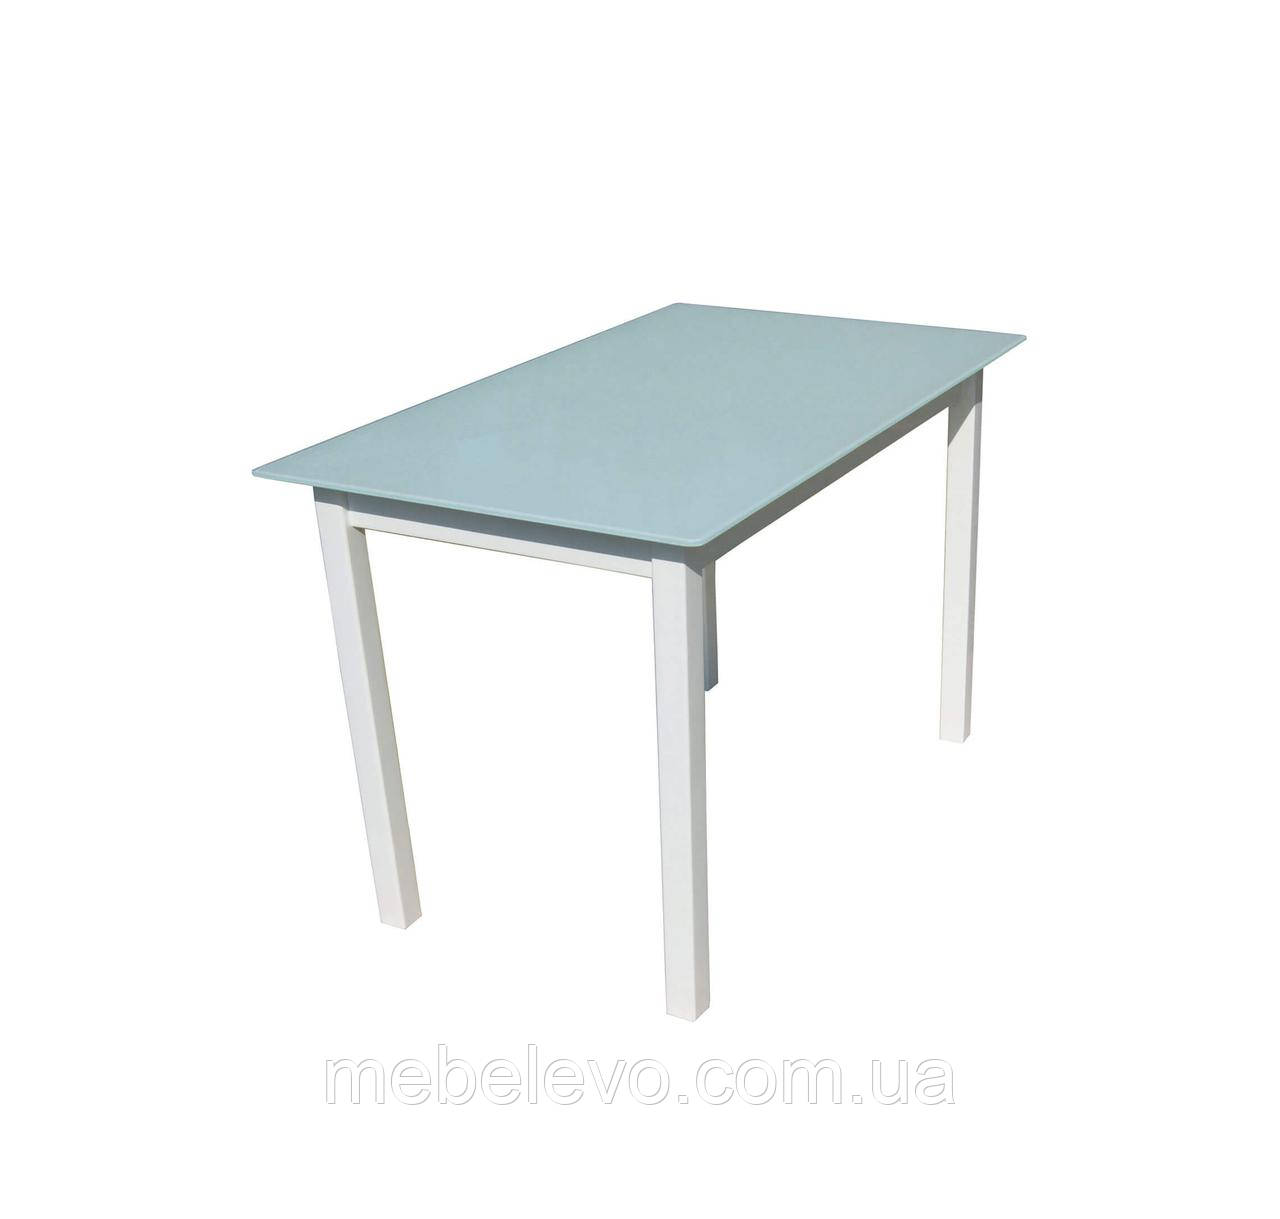 Стол дерево + стекло Монарх Белиссимо 750х1100х640мм    Sentenzo